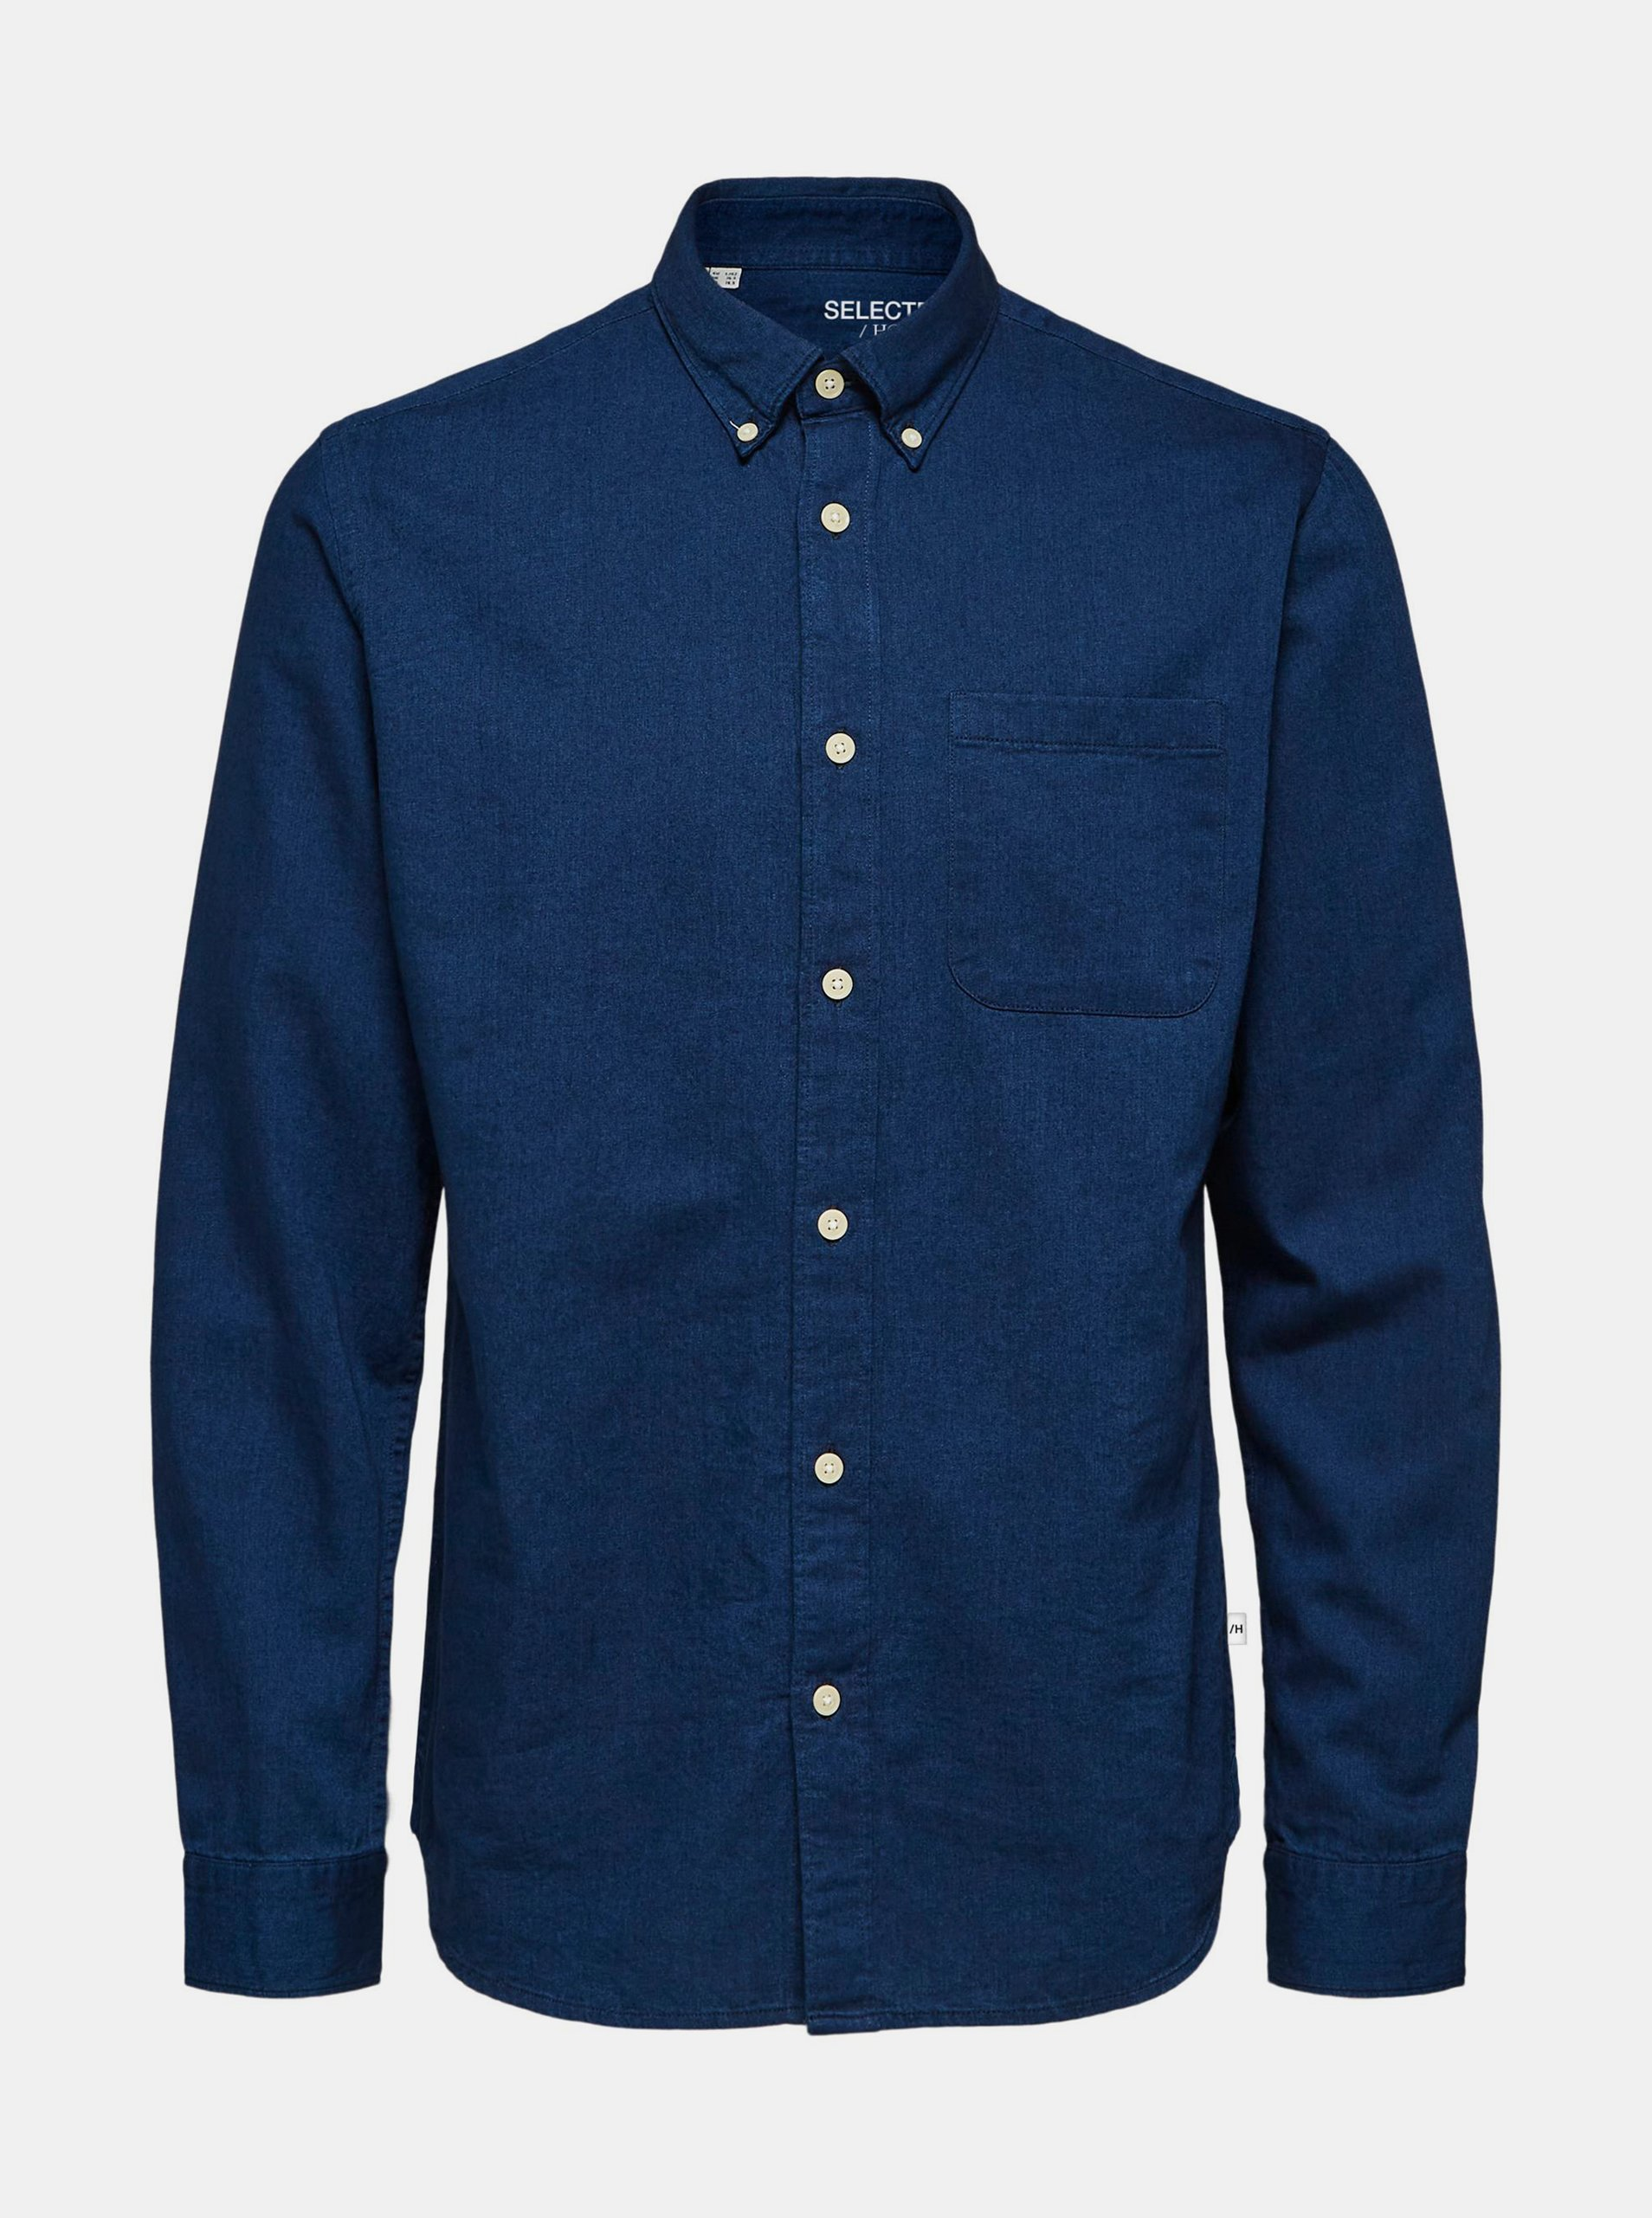 Tmavomodrá rifľová košeľa Selected Homme Regrick.